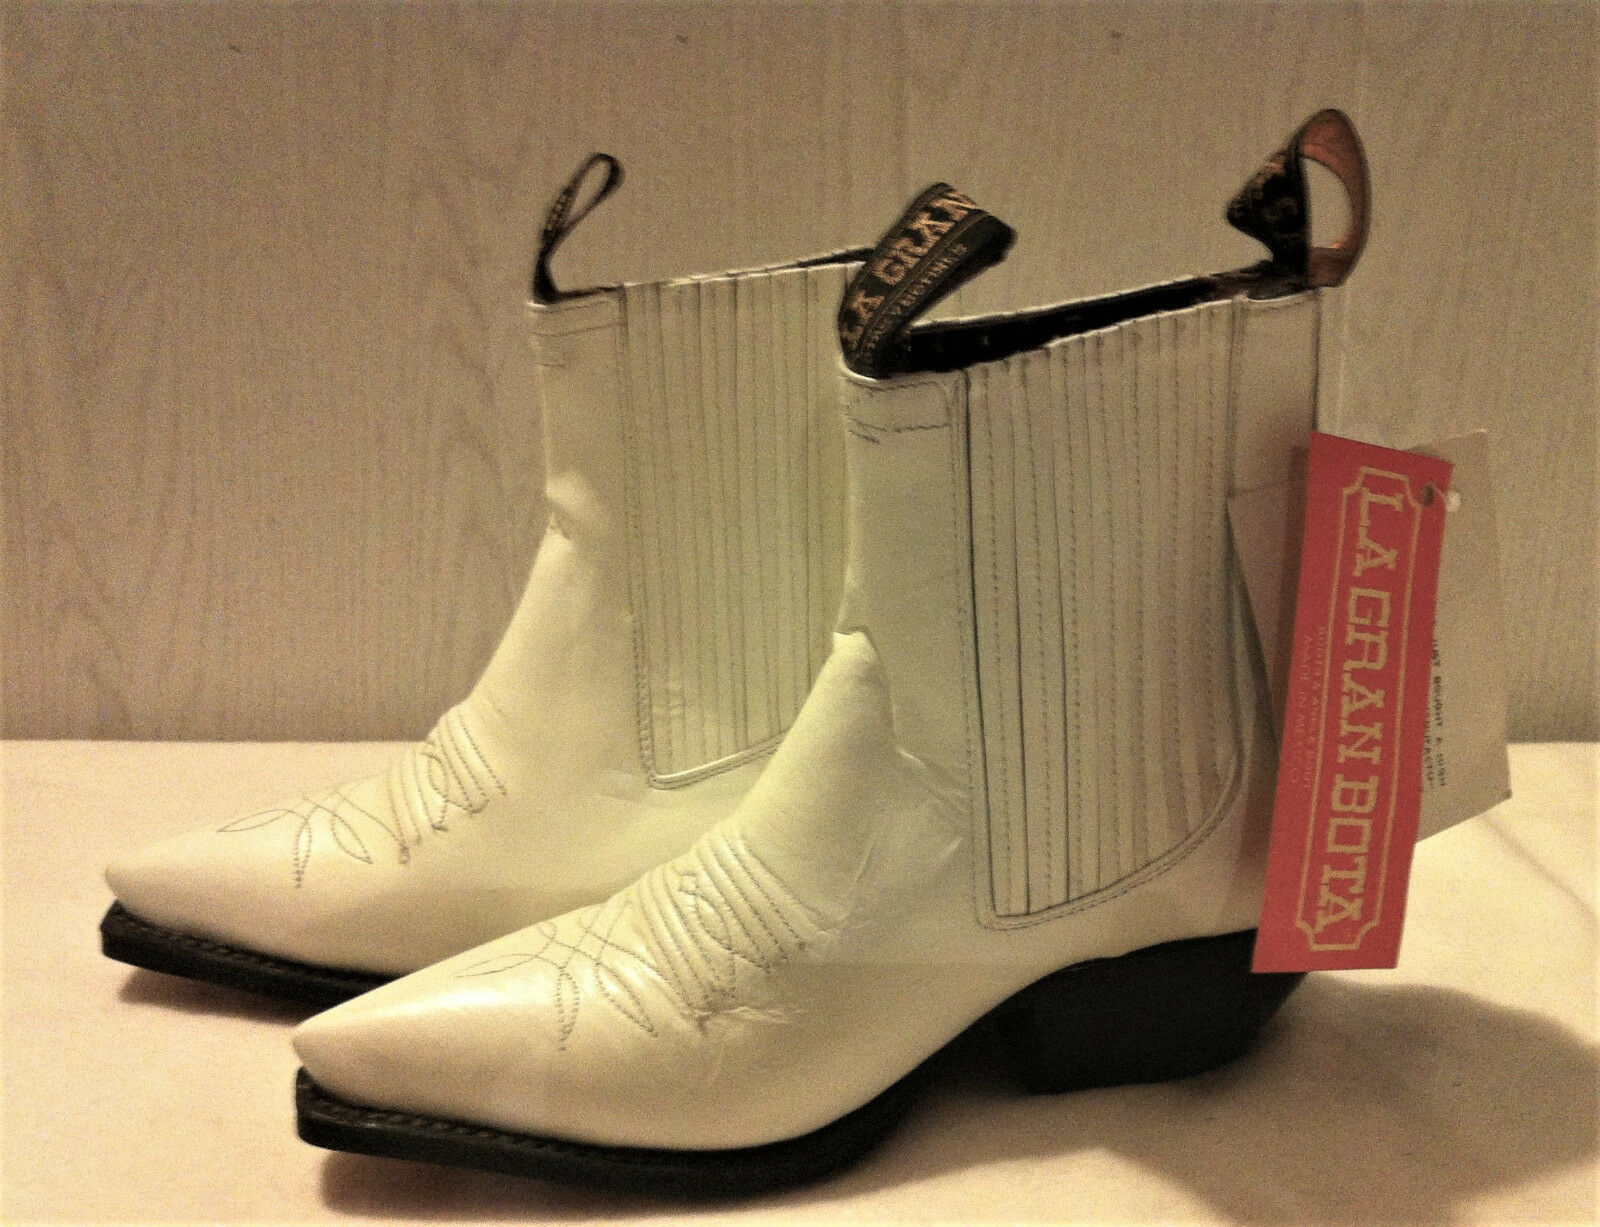 Stiefeletten Mexikanische white white white - Marke   das Gramm Boot   - VINTAGE 90s 7f2d15